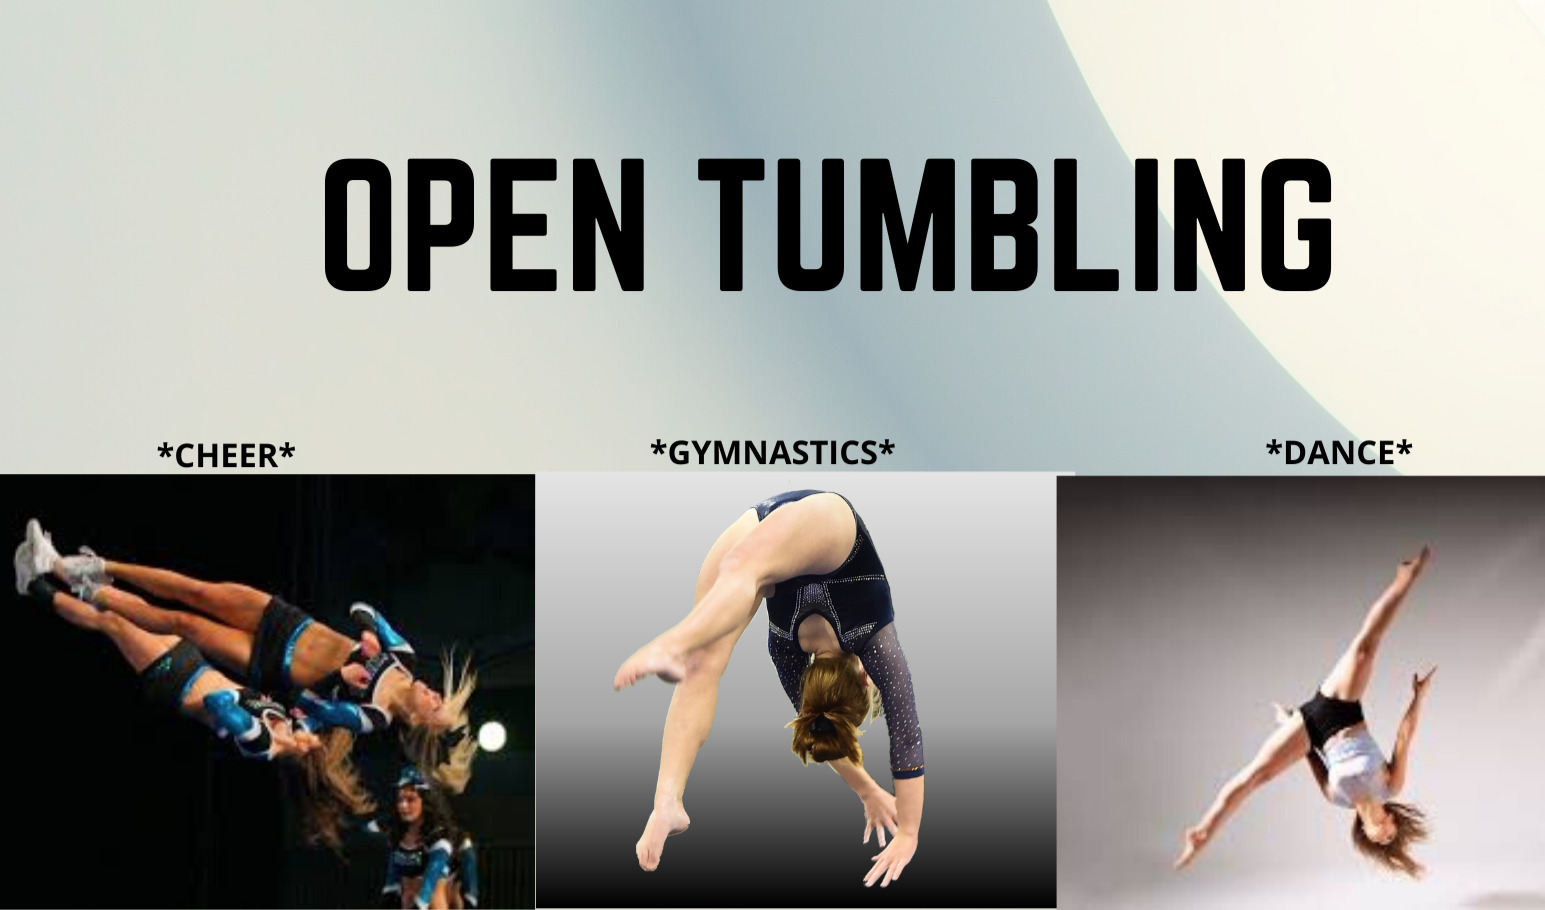 Open Tumbling